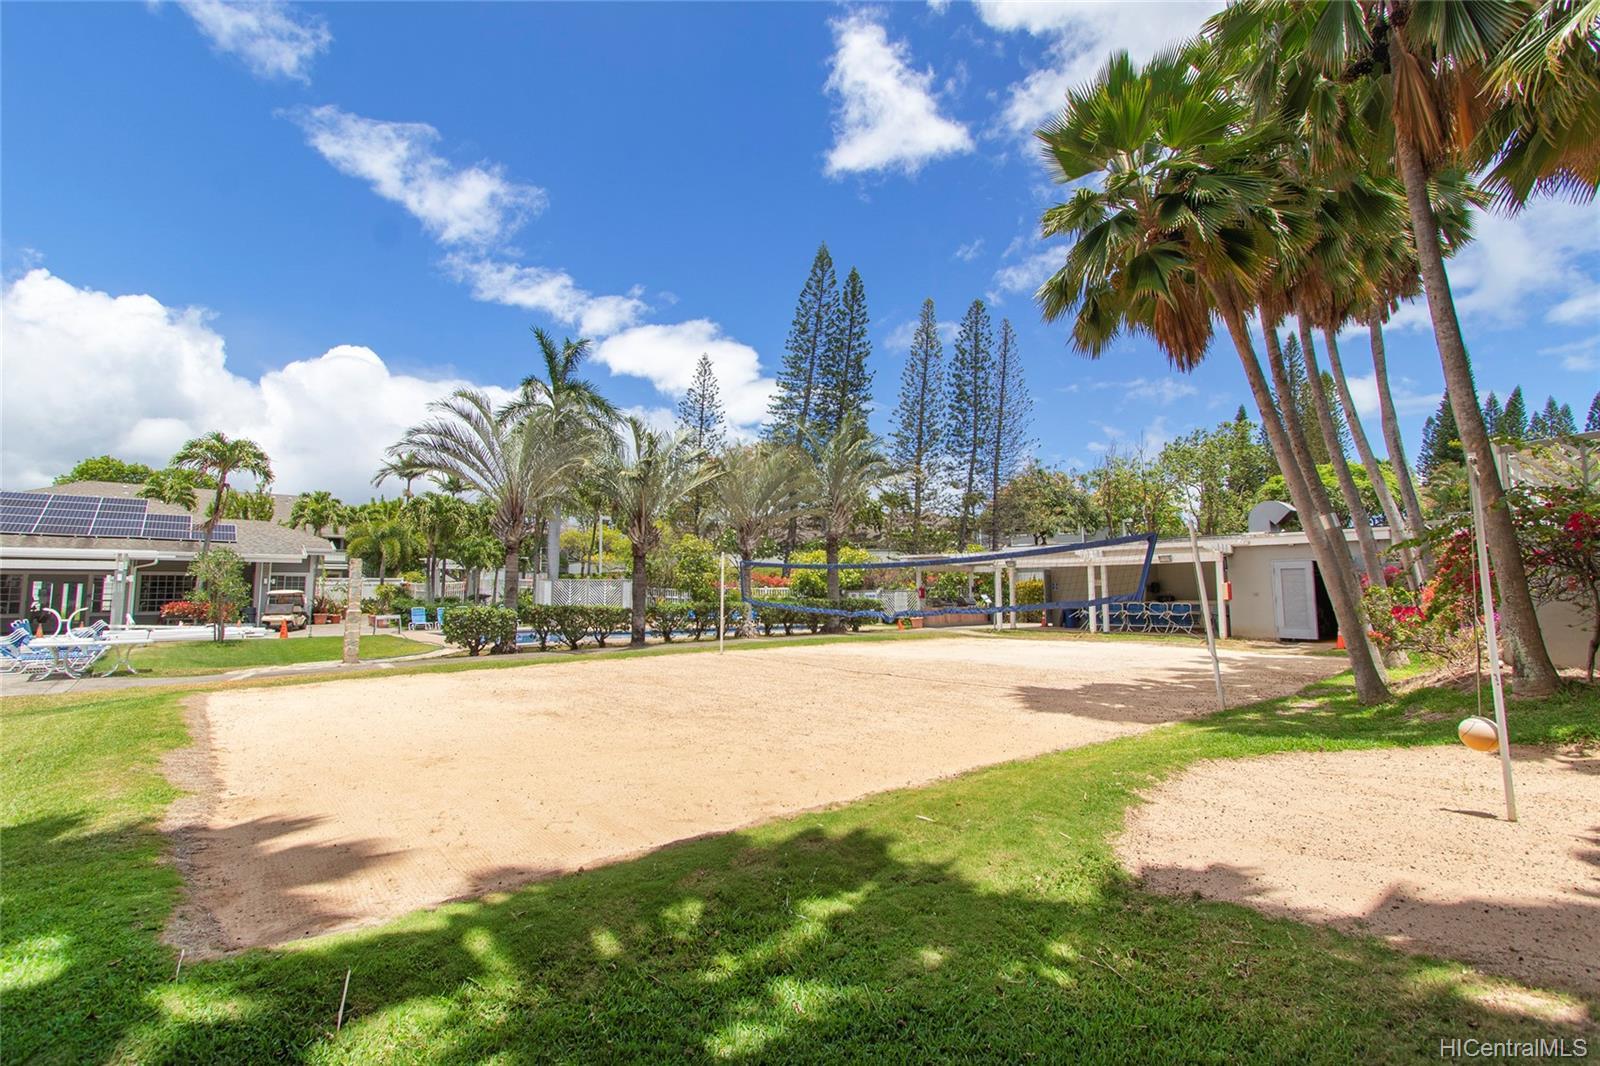 311 Mananai Place townhouse # 45A, Honolulu, Hawaii - photo 23 of 25